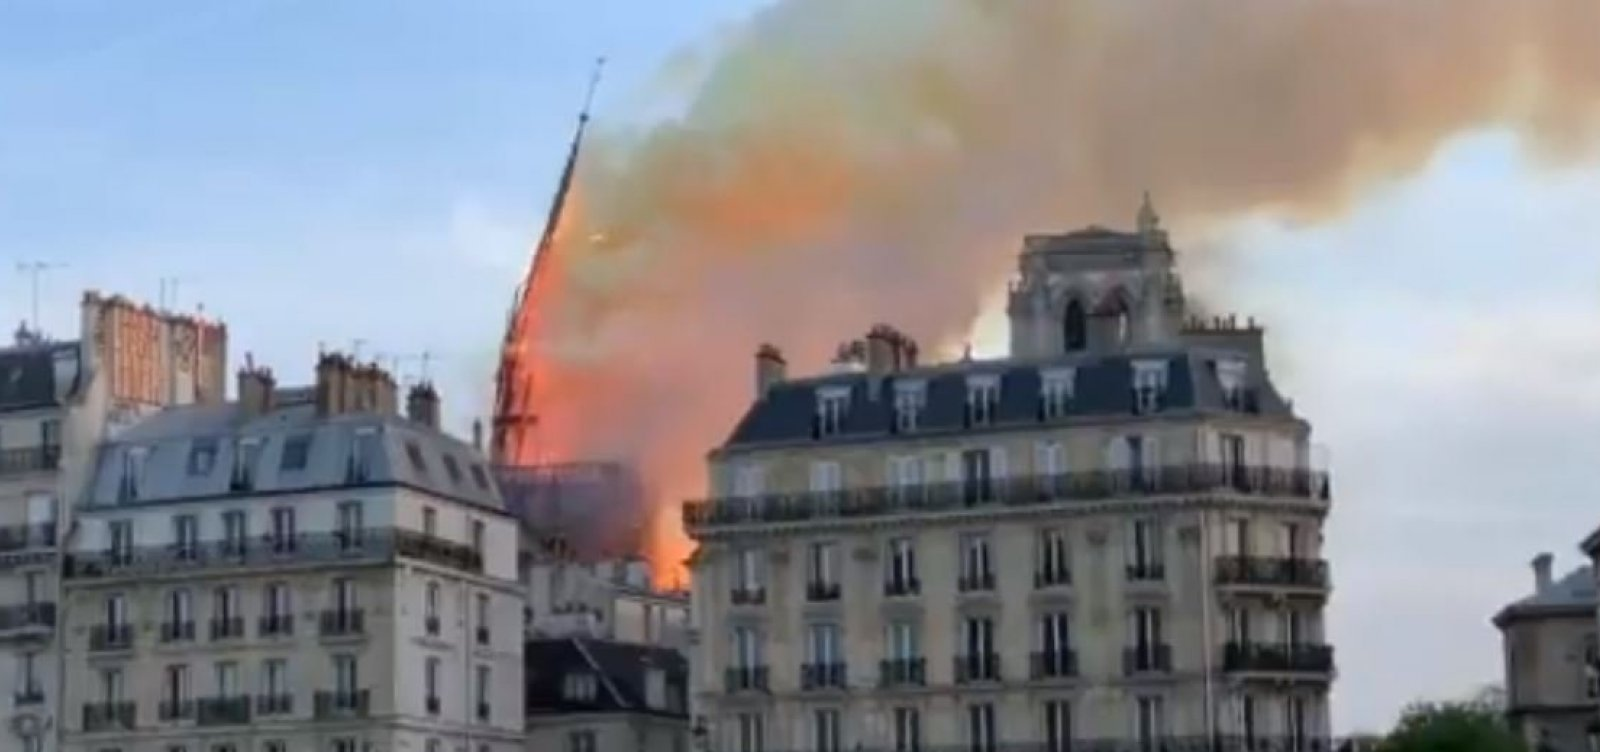 Torre da Catedral de Notre-Dame desaba durante incêndio; confira